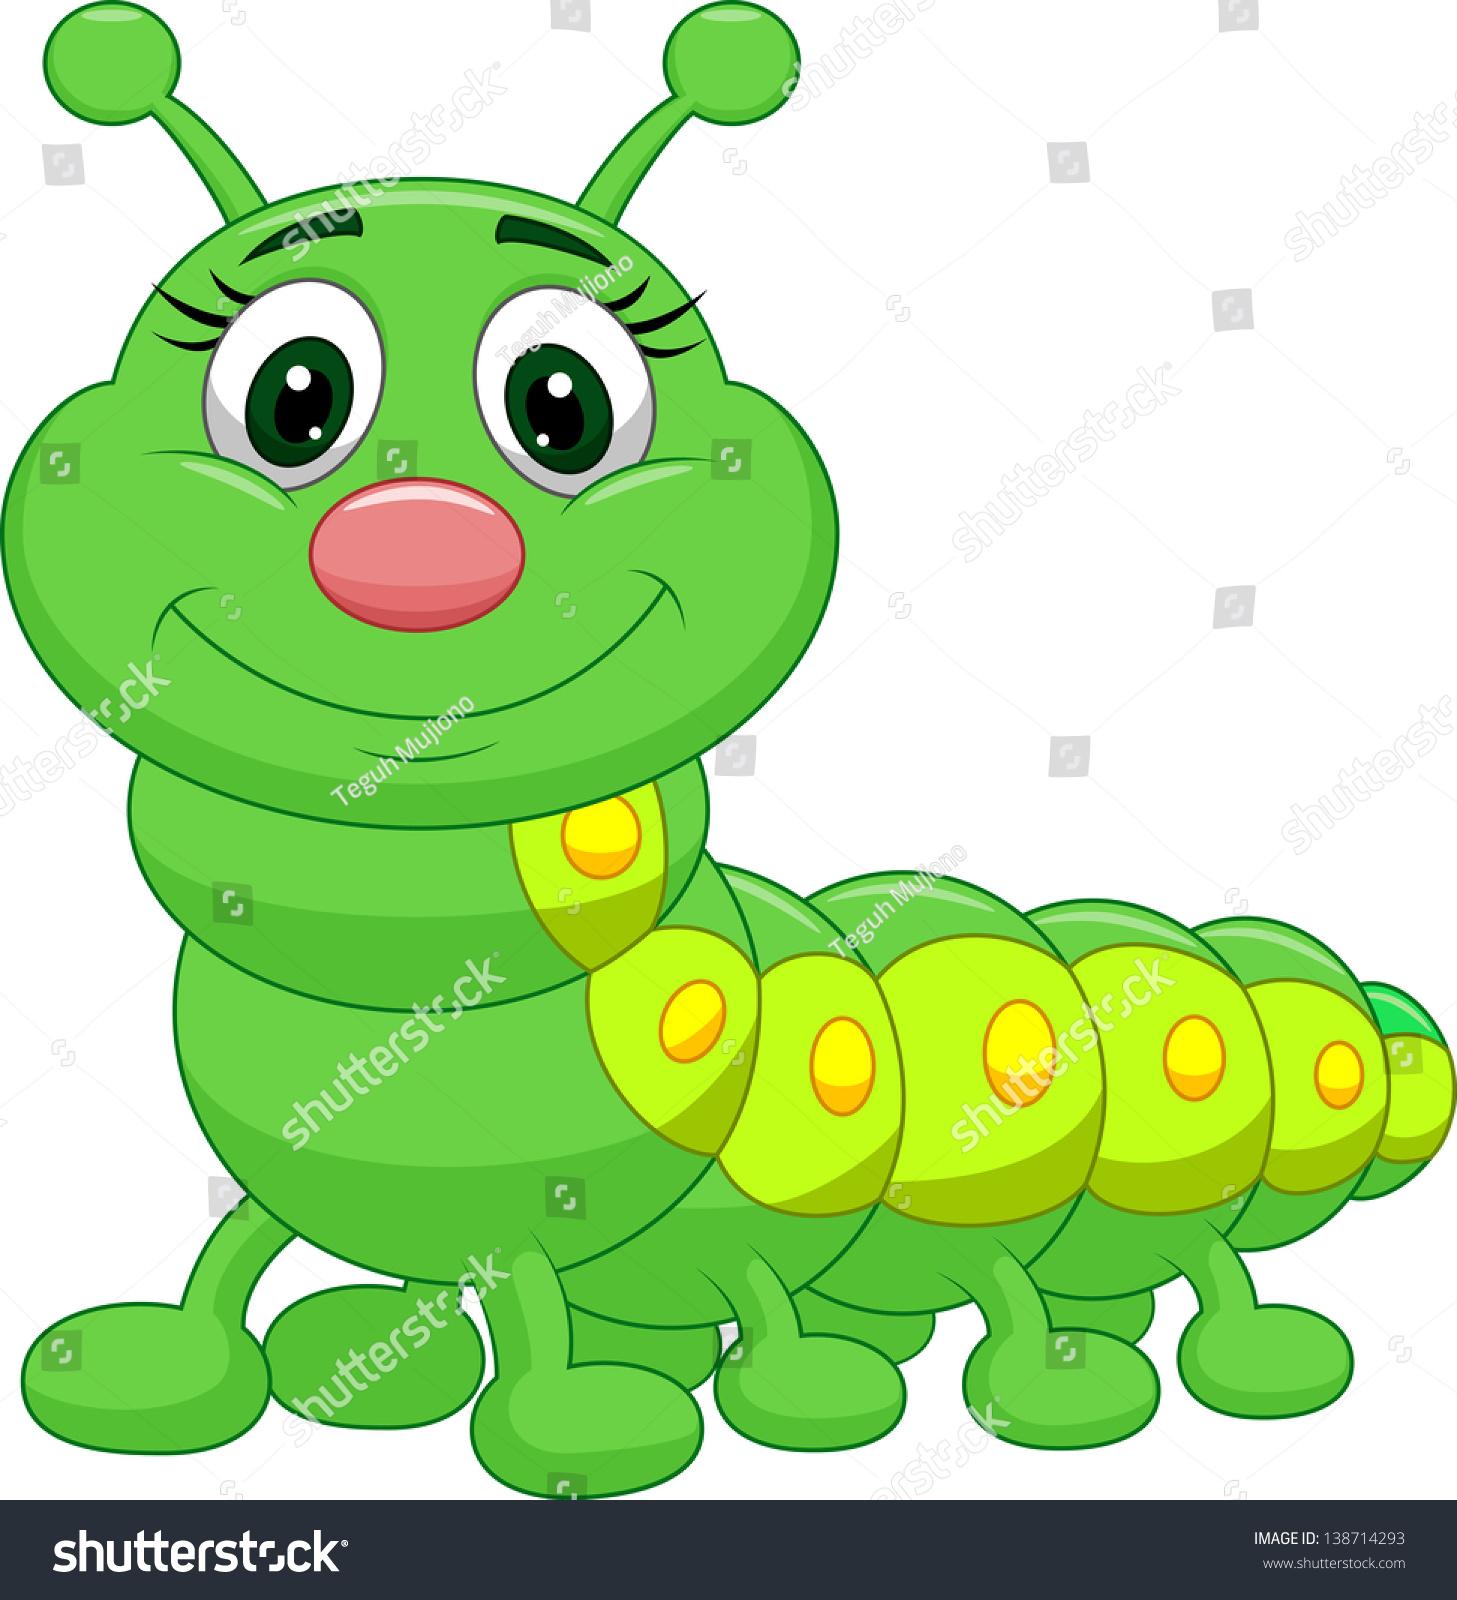 Cute Caterpillar Cartoon Stock Vector Illustration ... Гусеница Вектор